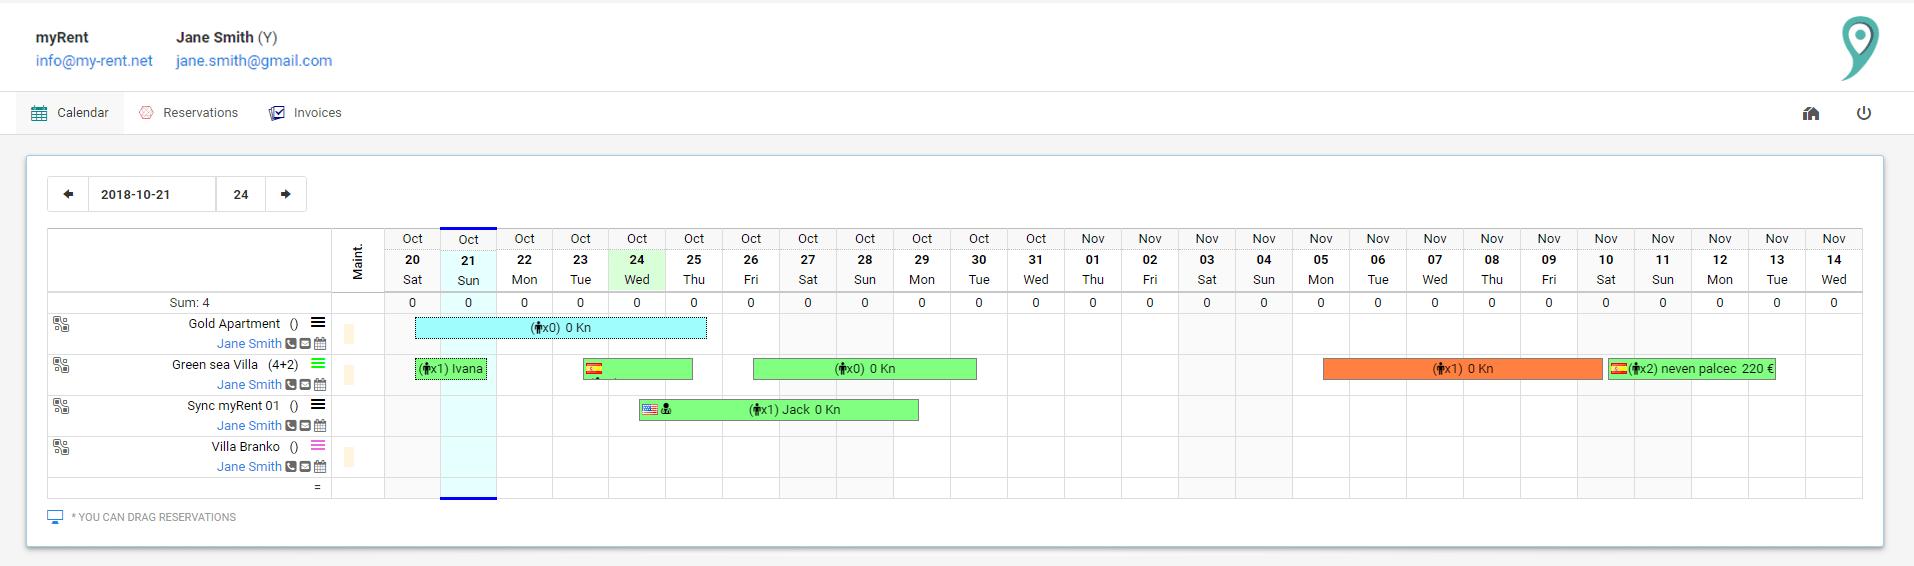 myrent-owner-calendar01